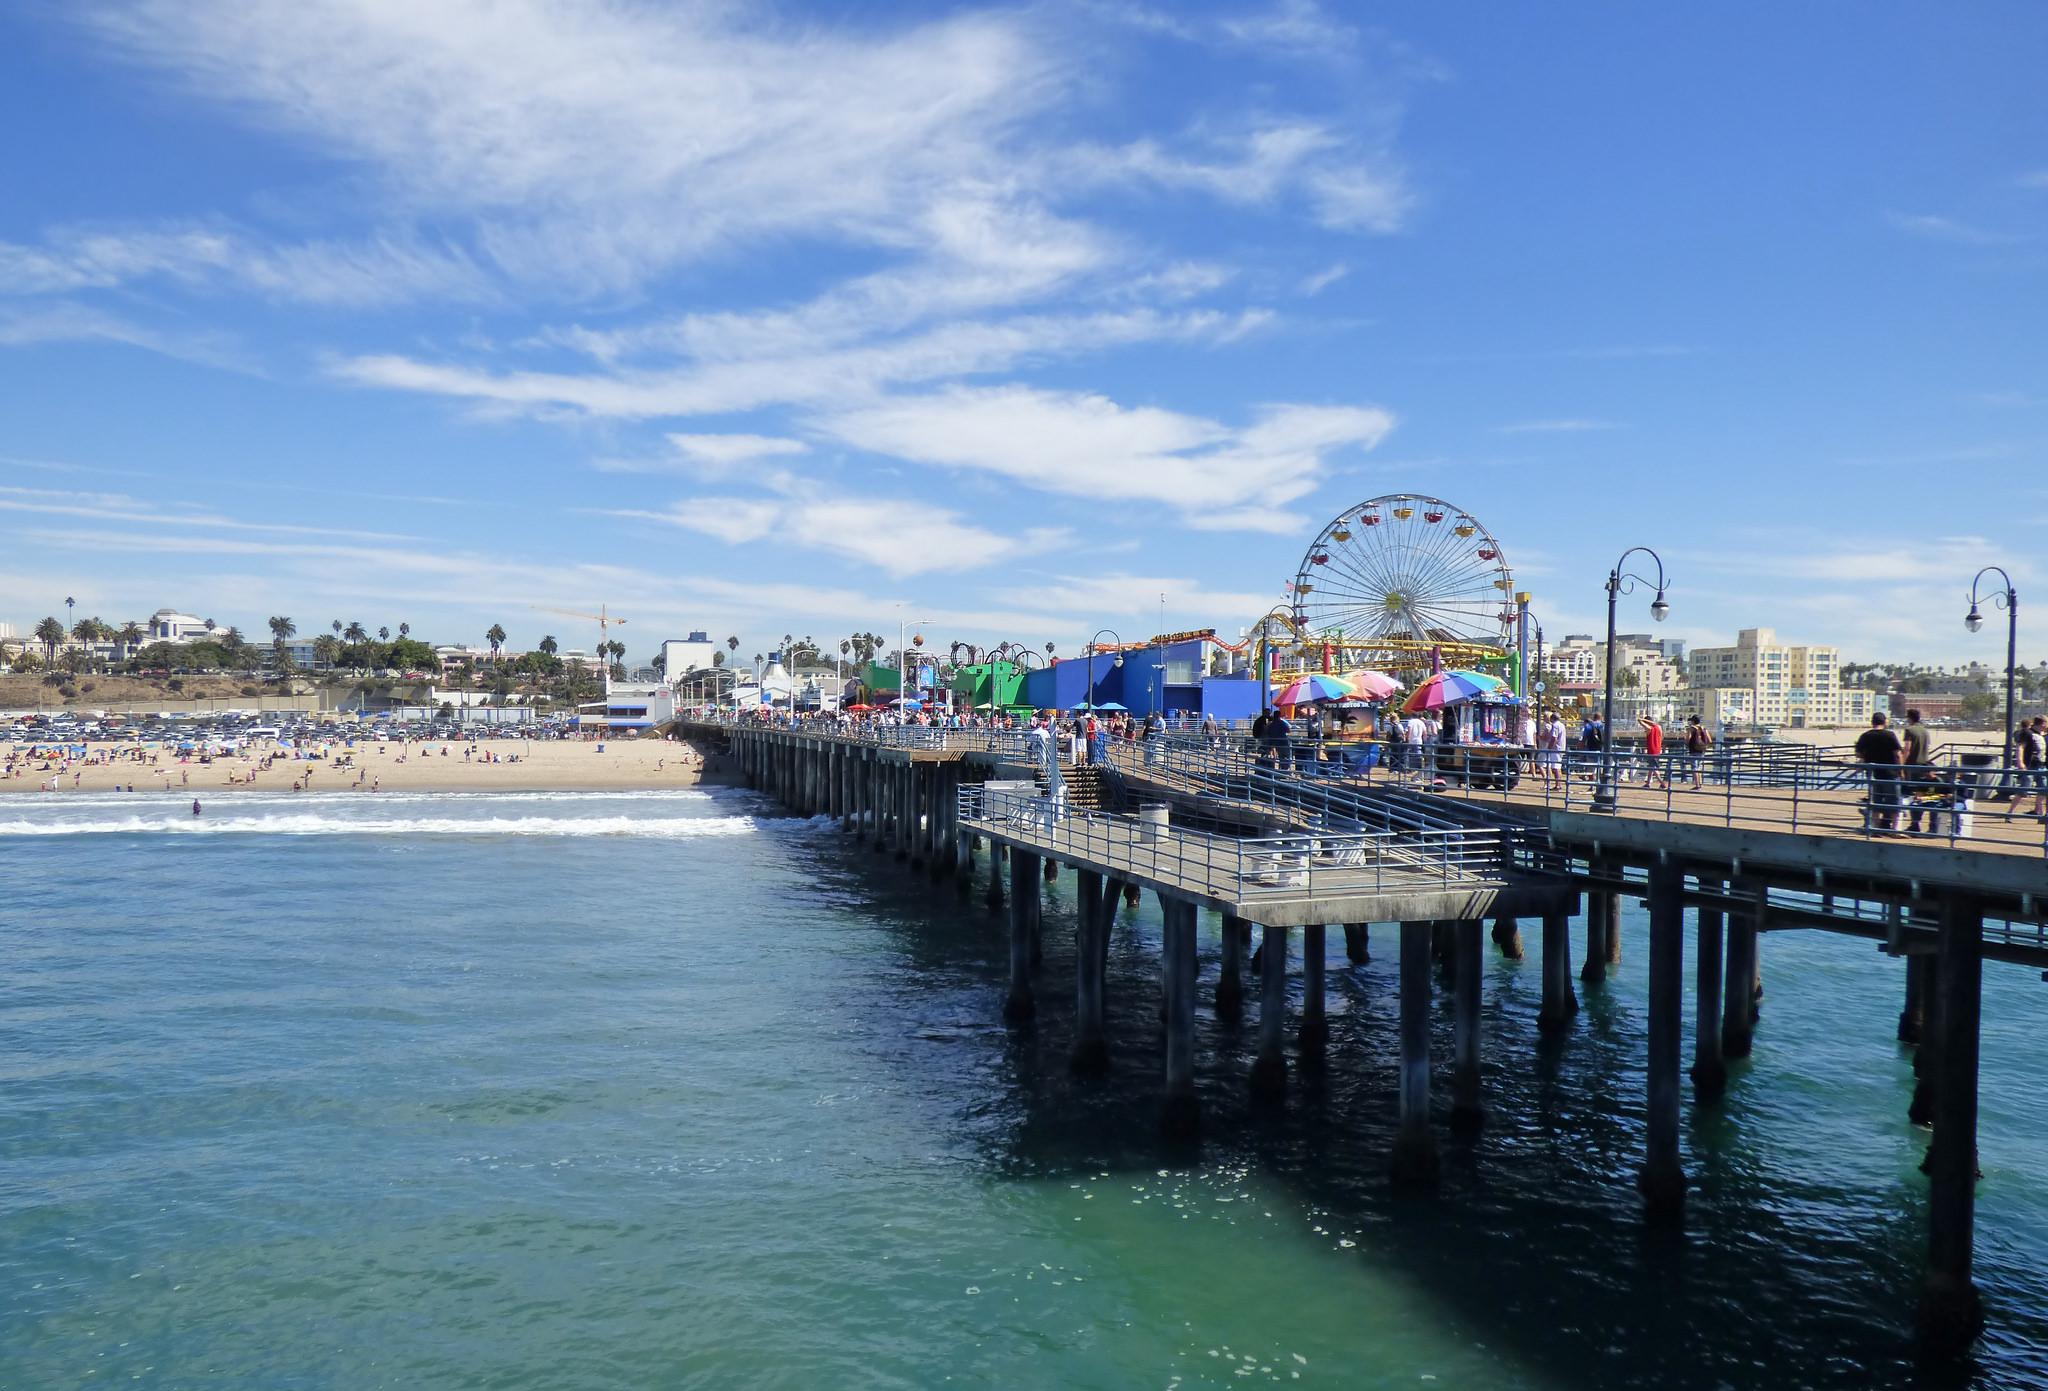 A photo of the Santa Monica Pier.